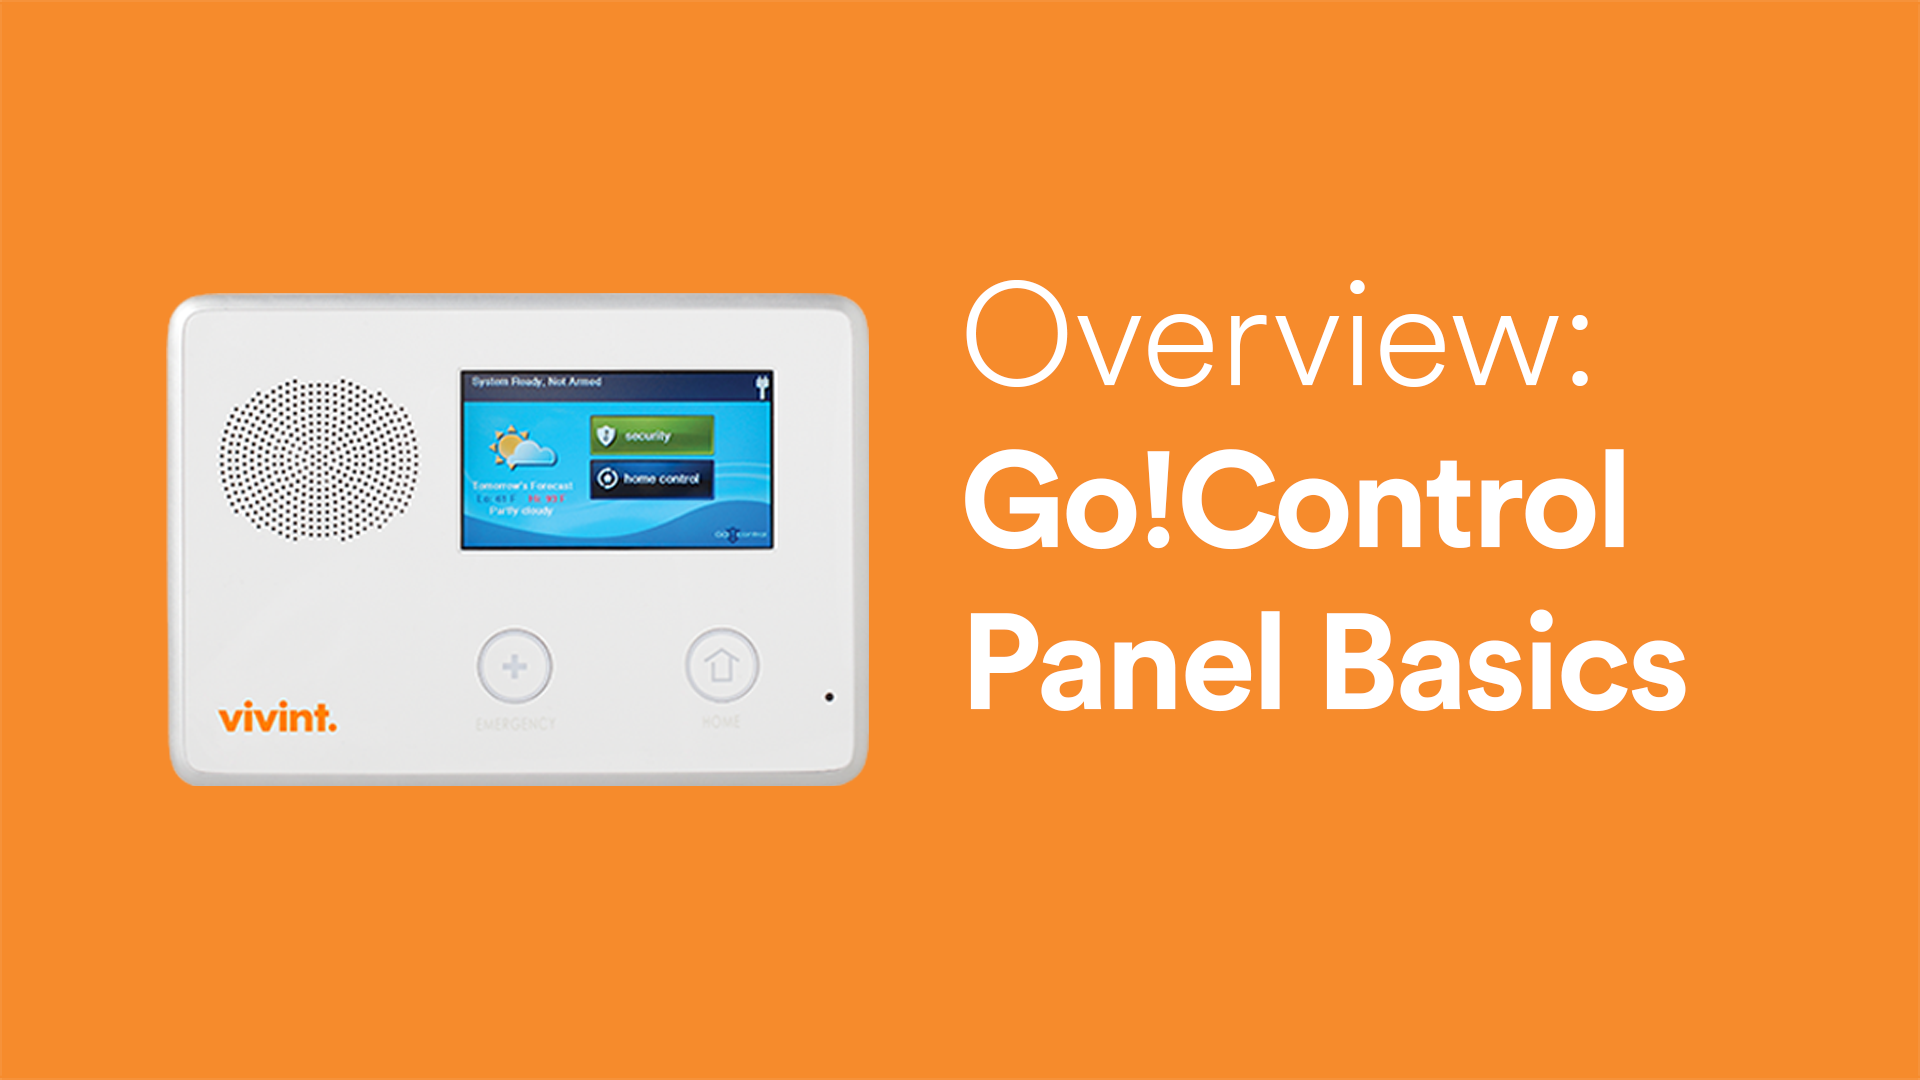 Vivint Go Control Panel Basics Video Support Hub